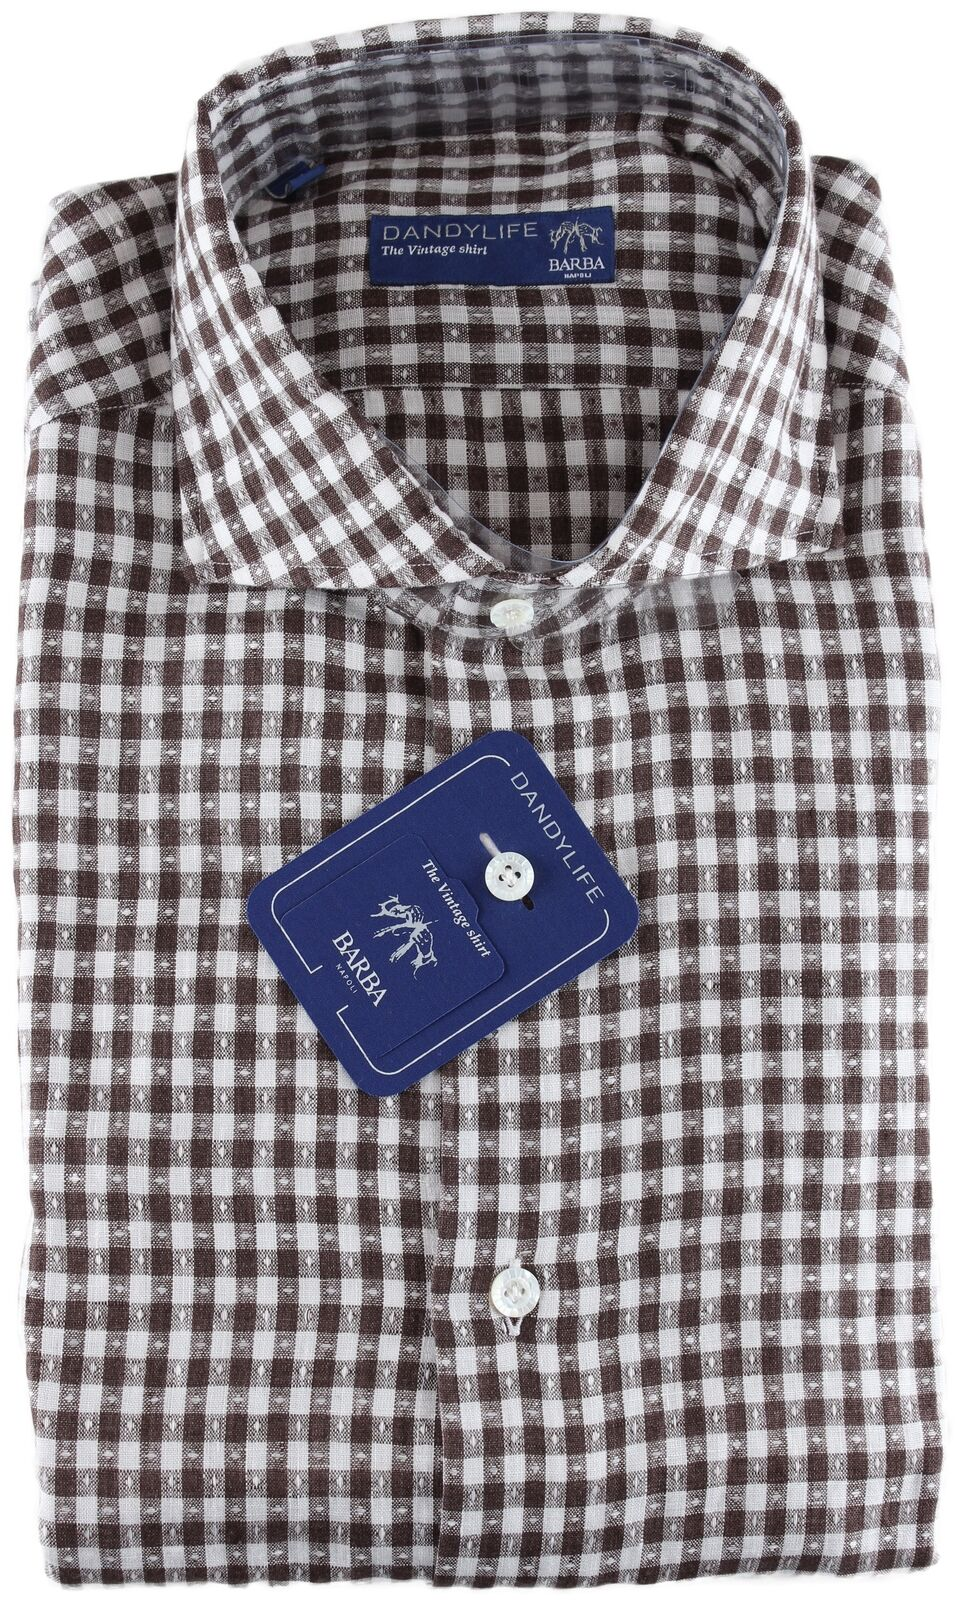 NWT BARBA NAPOLI hemd dandy life checked braun & Weiß linen handmade 40 15 3 4